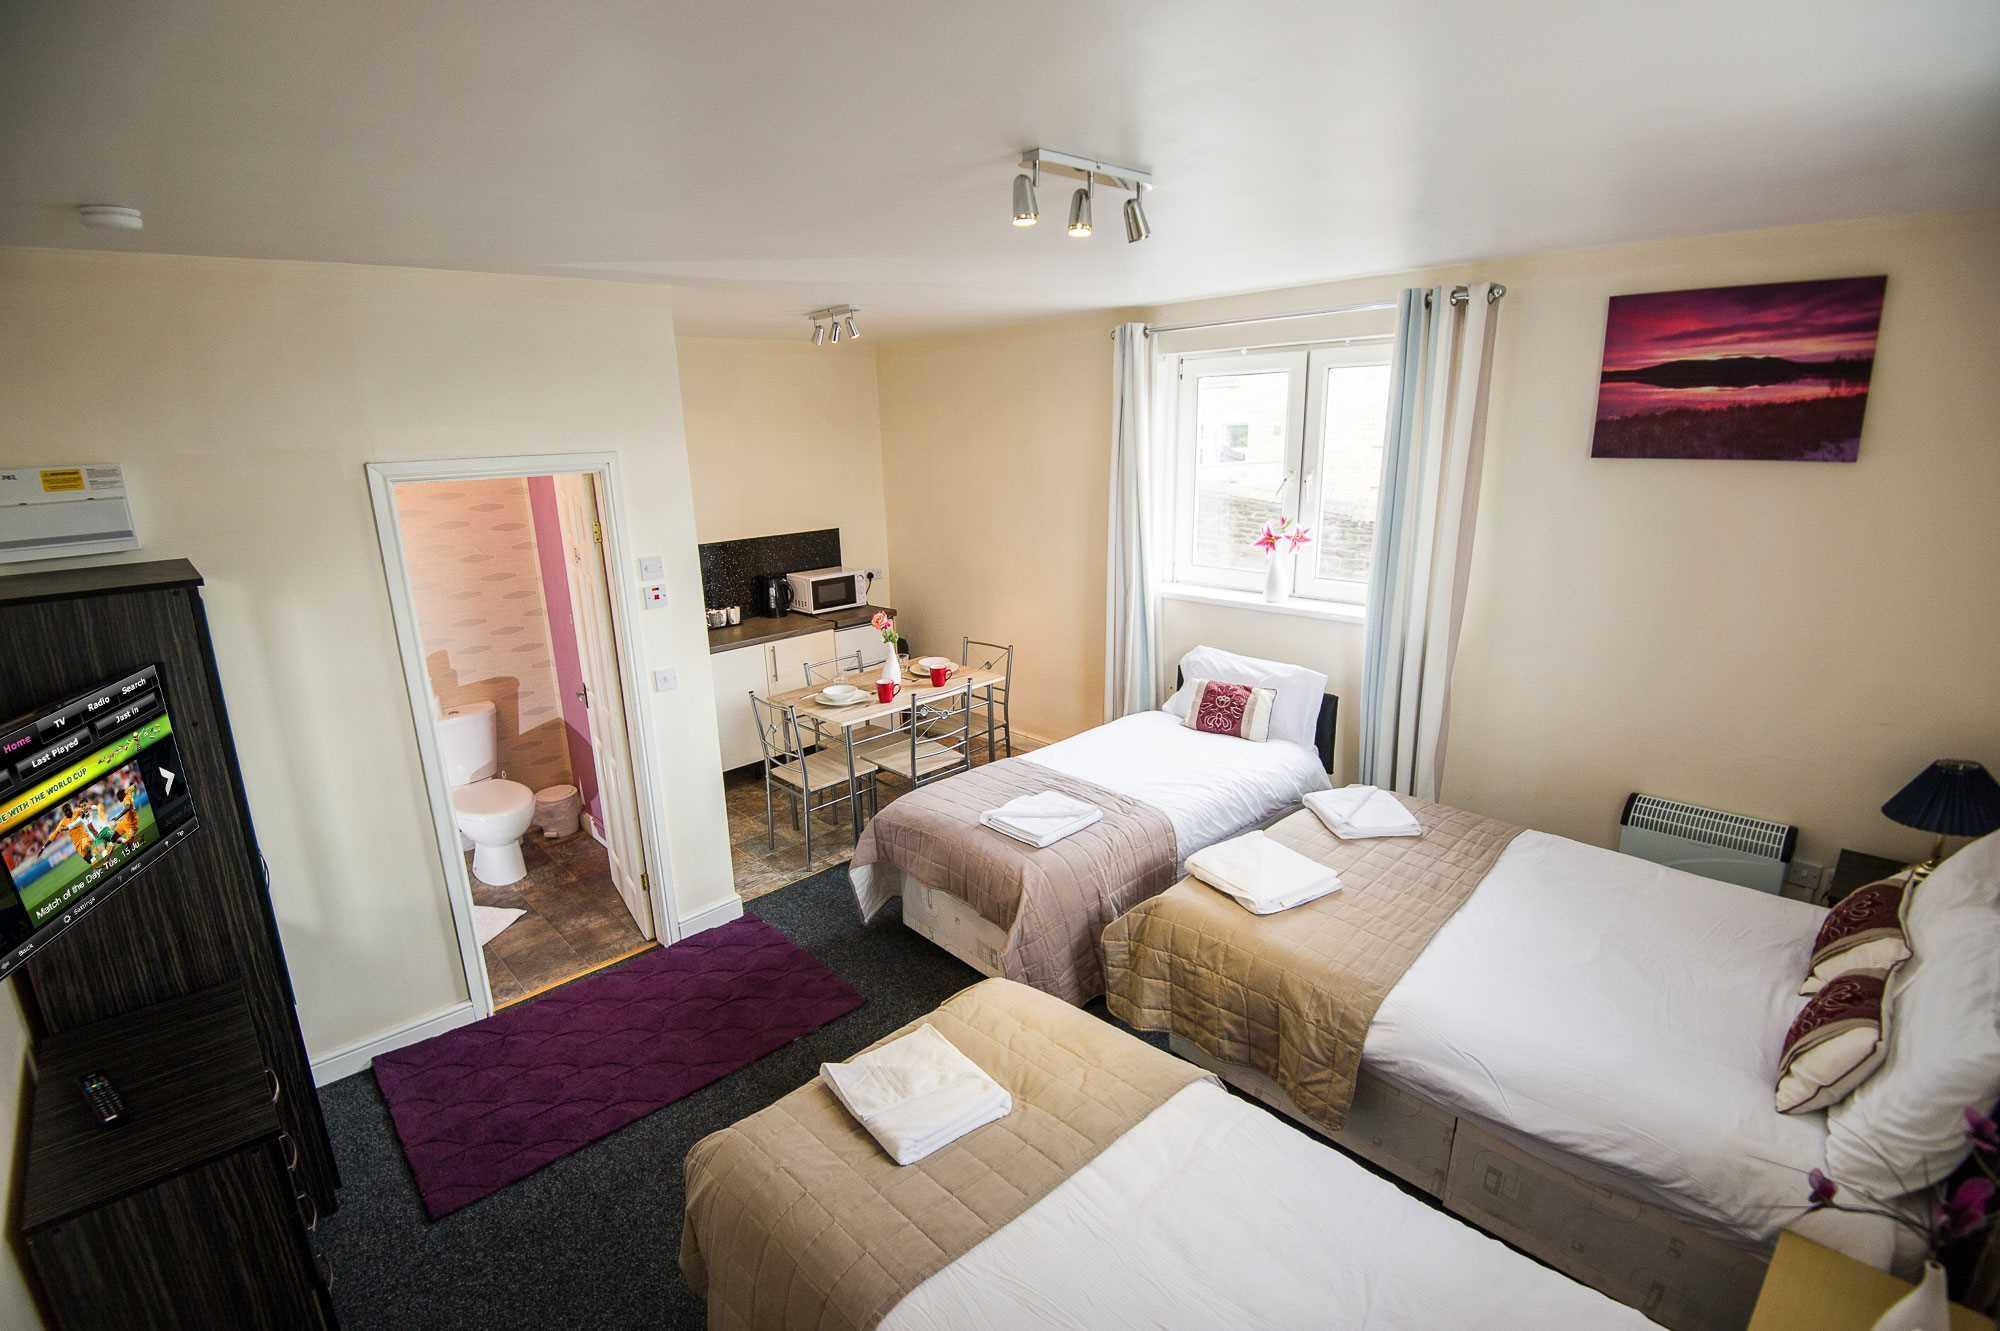 92 Bradford Apartments Reviews